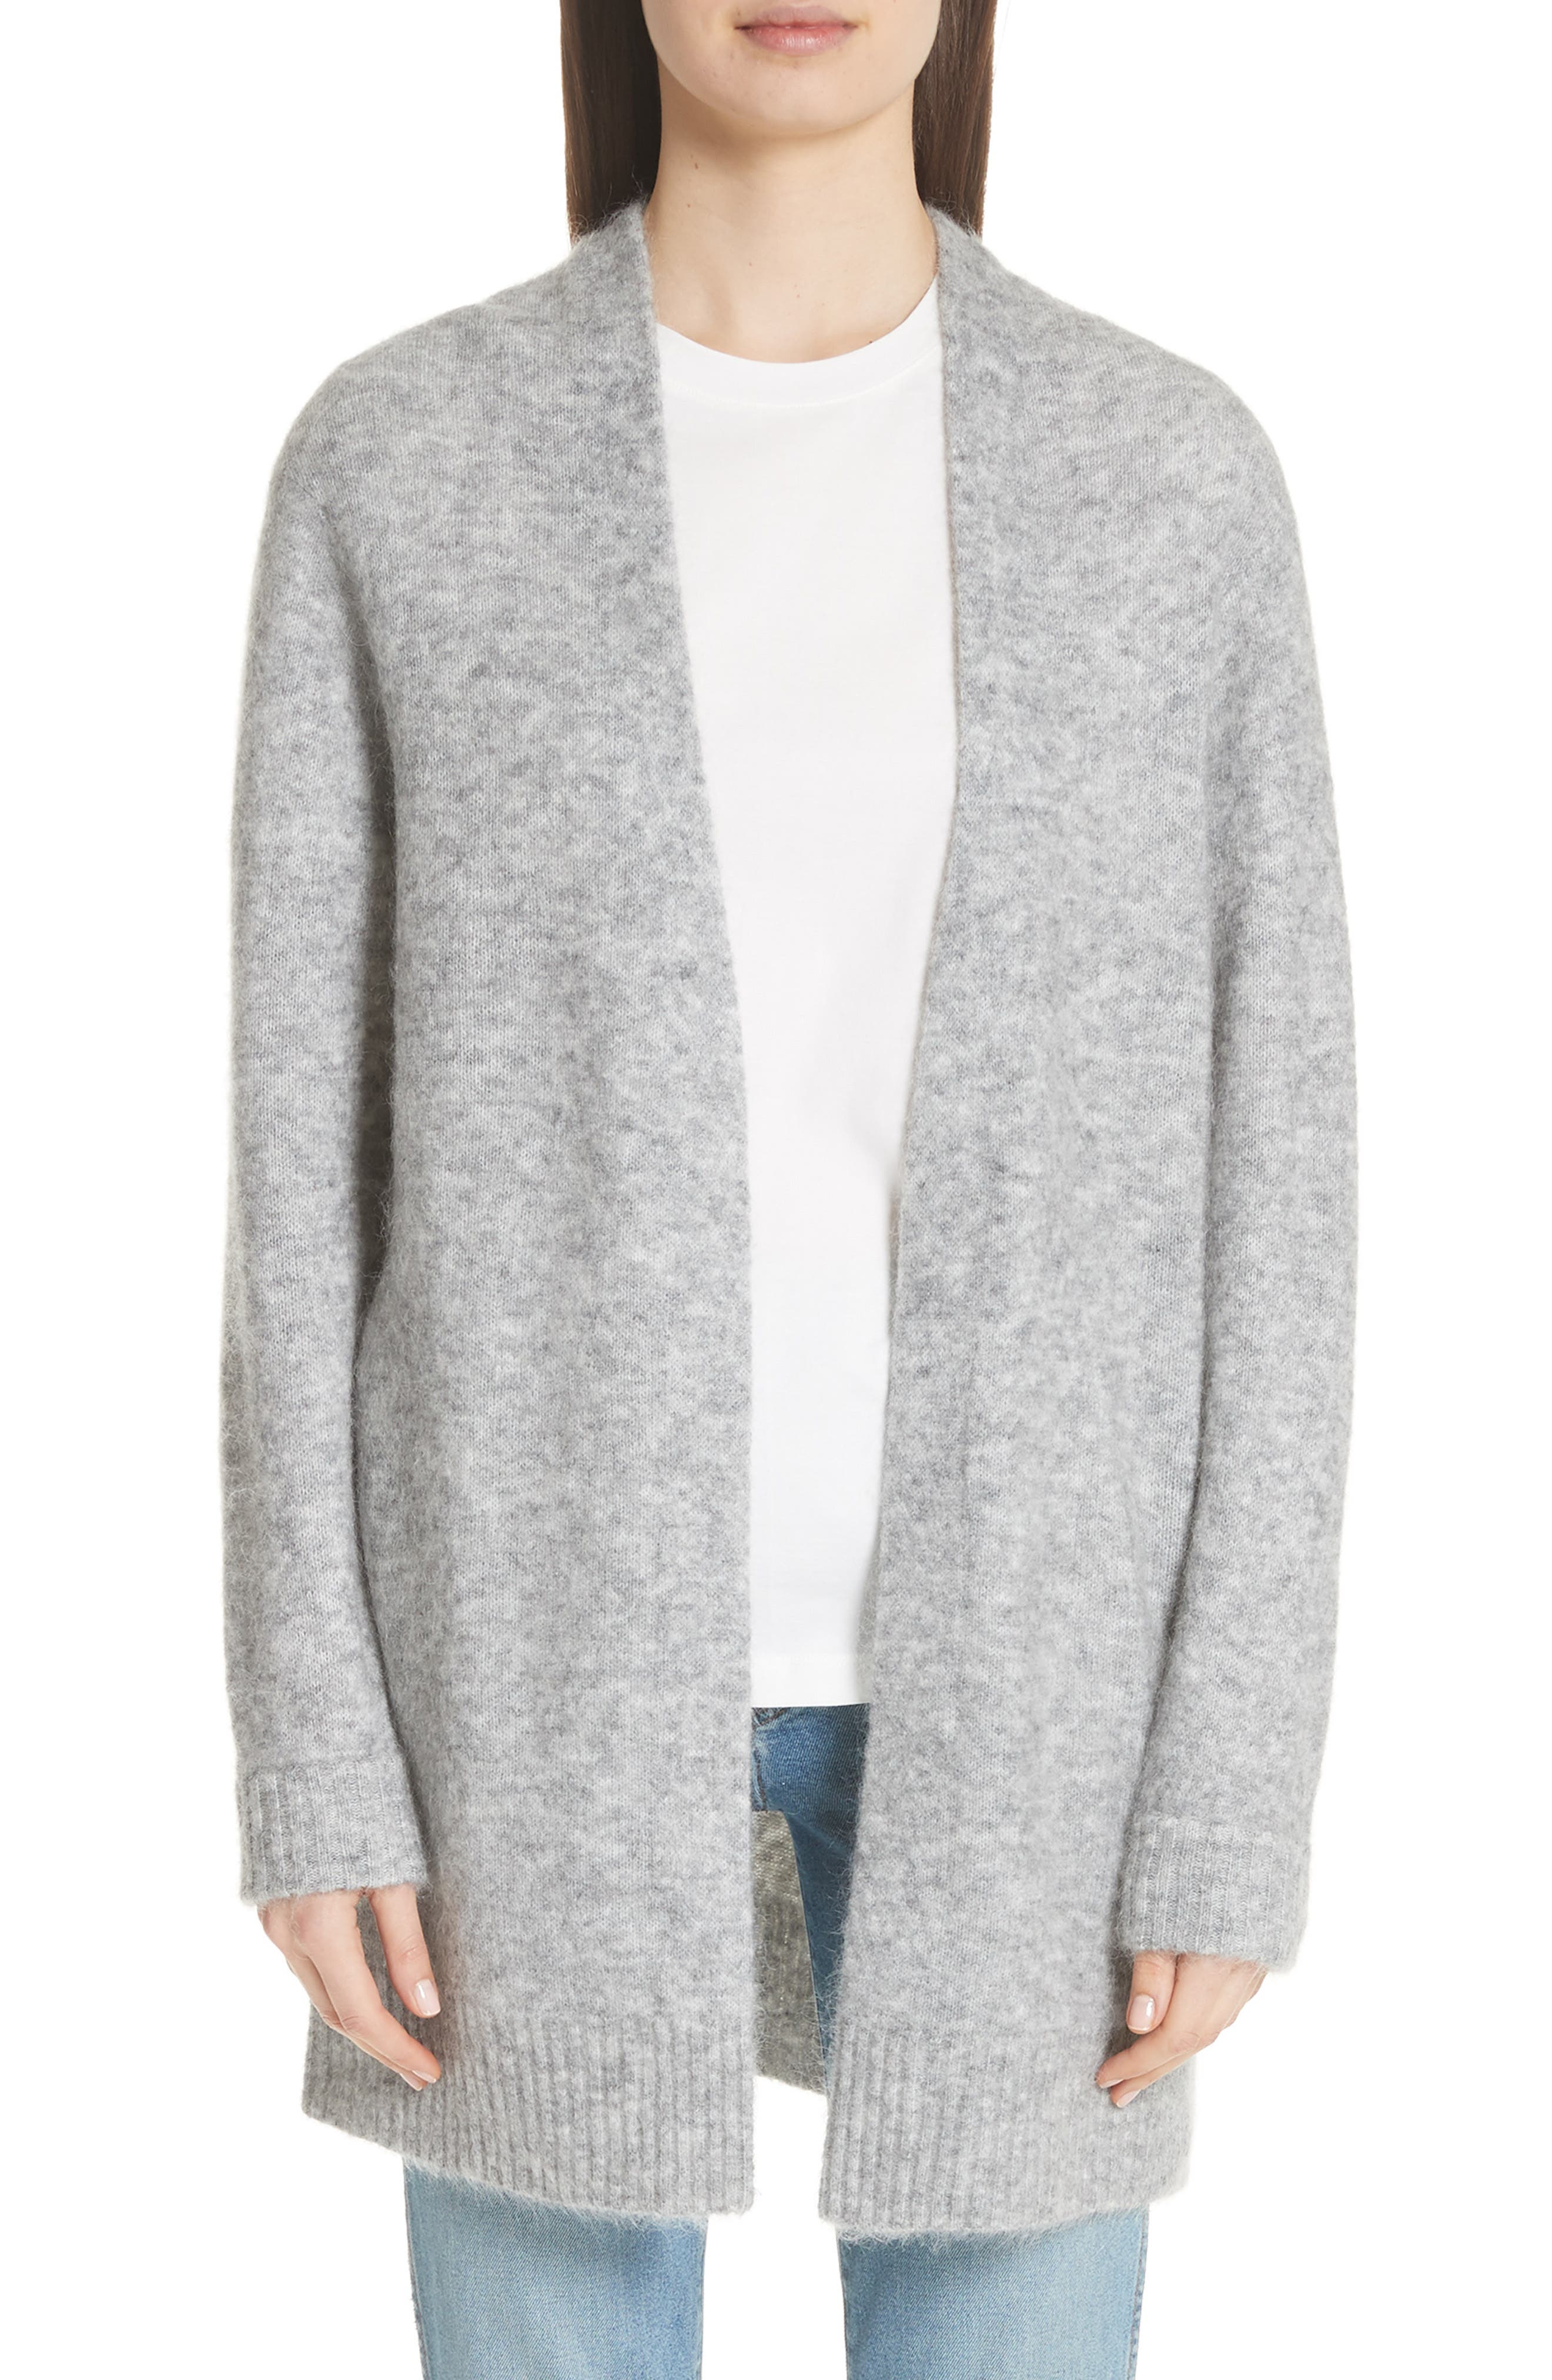 Raya Sh Mohair Knit Cardigan,                         Main,                         color, Husky Grey